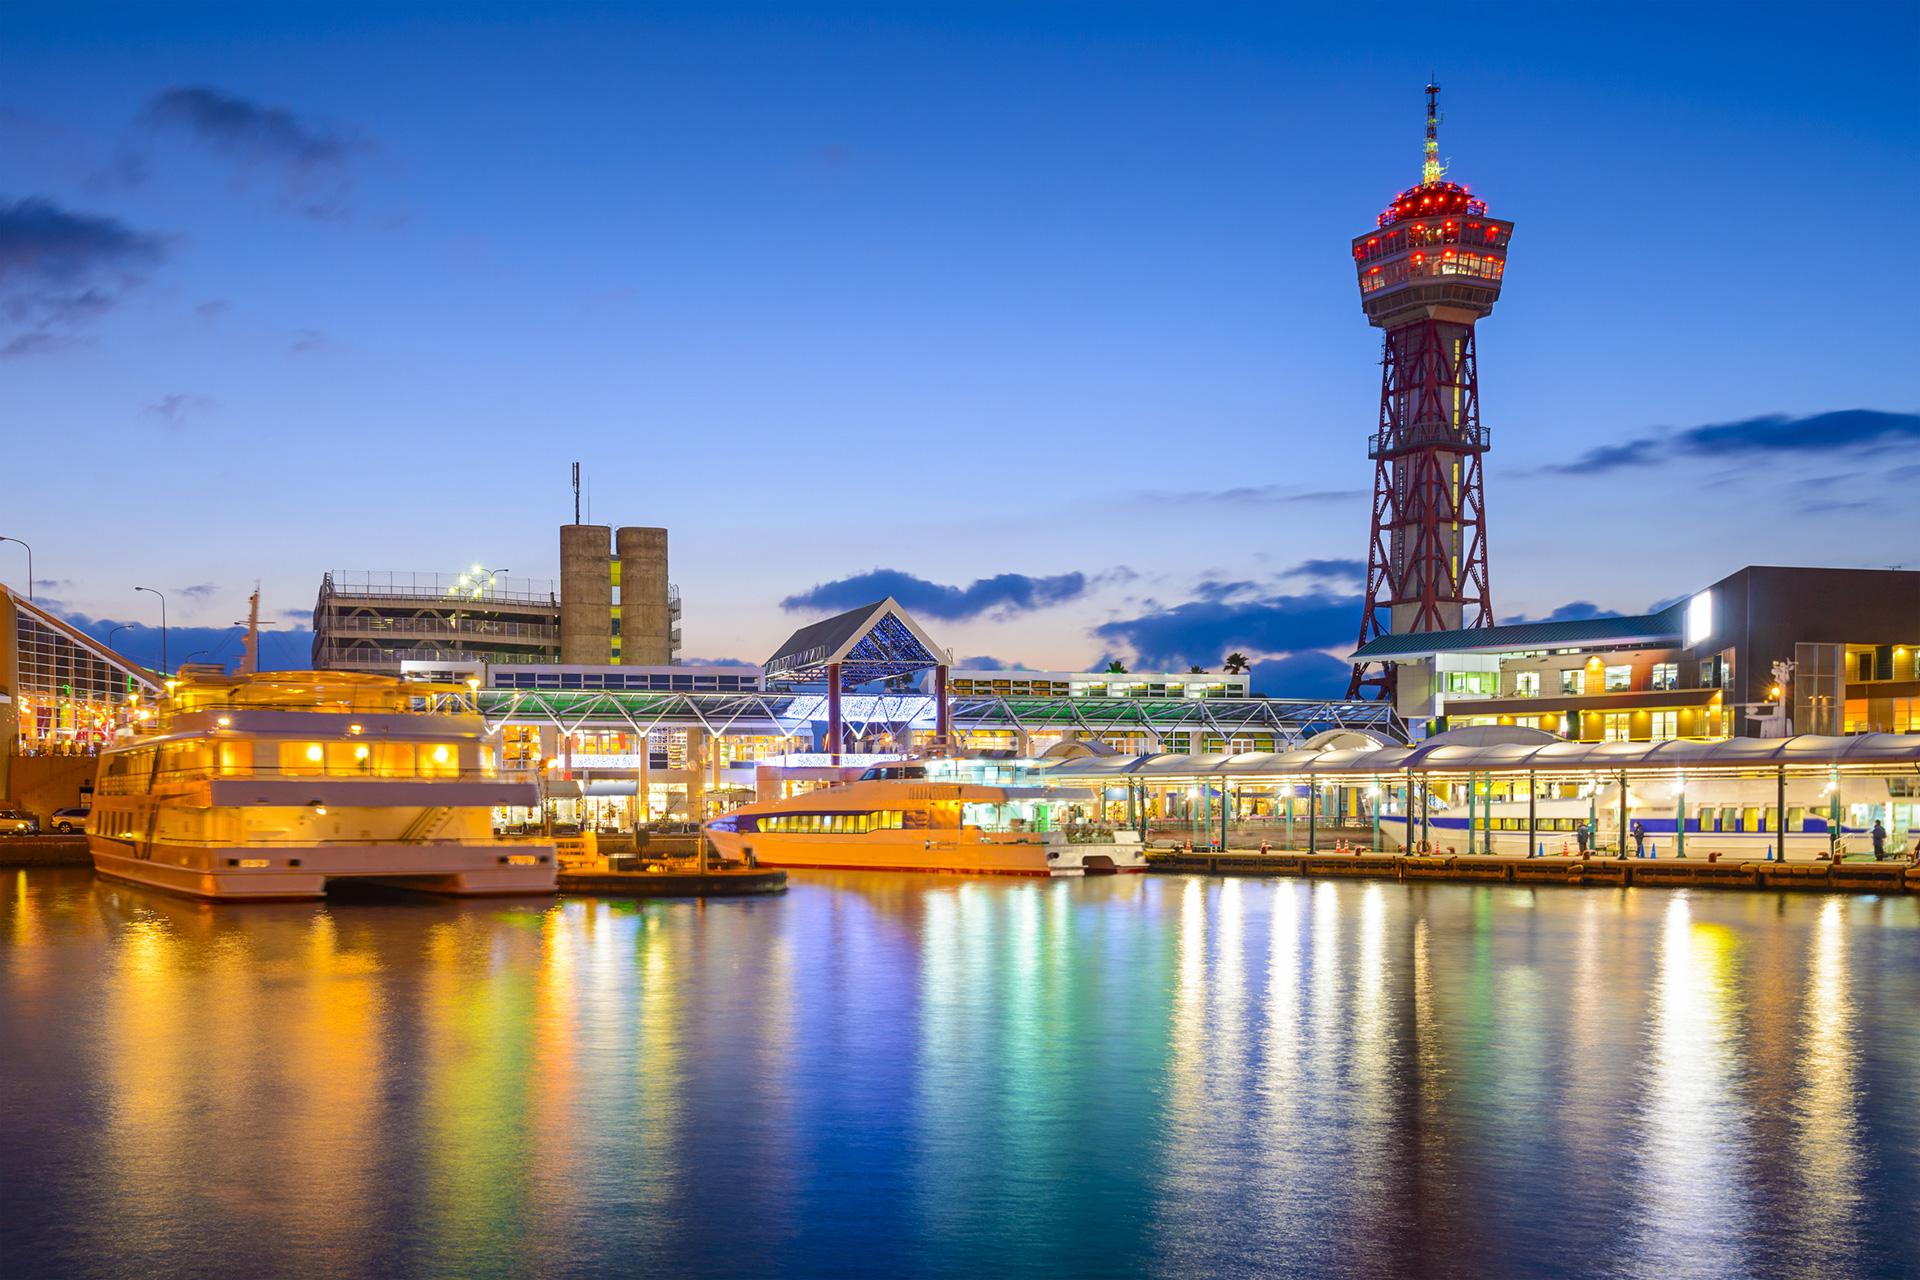 MSC辉煌号 上海-长崎-横滨2018年单边航次